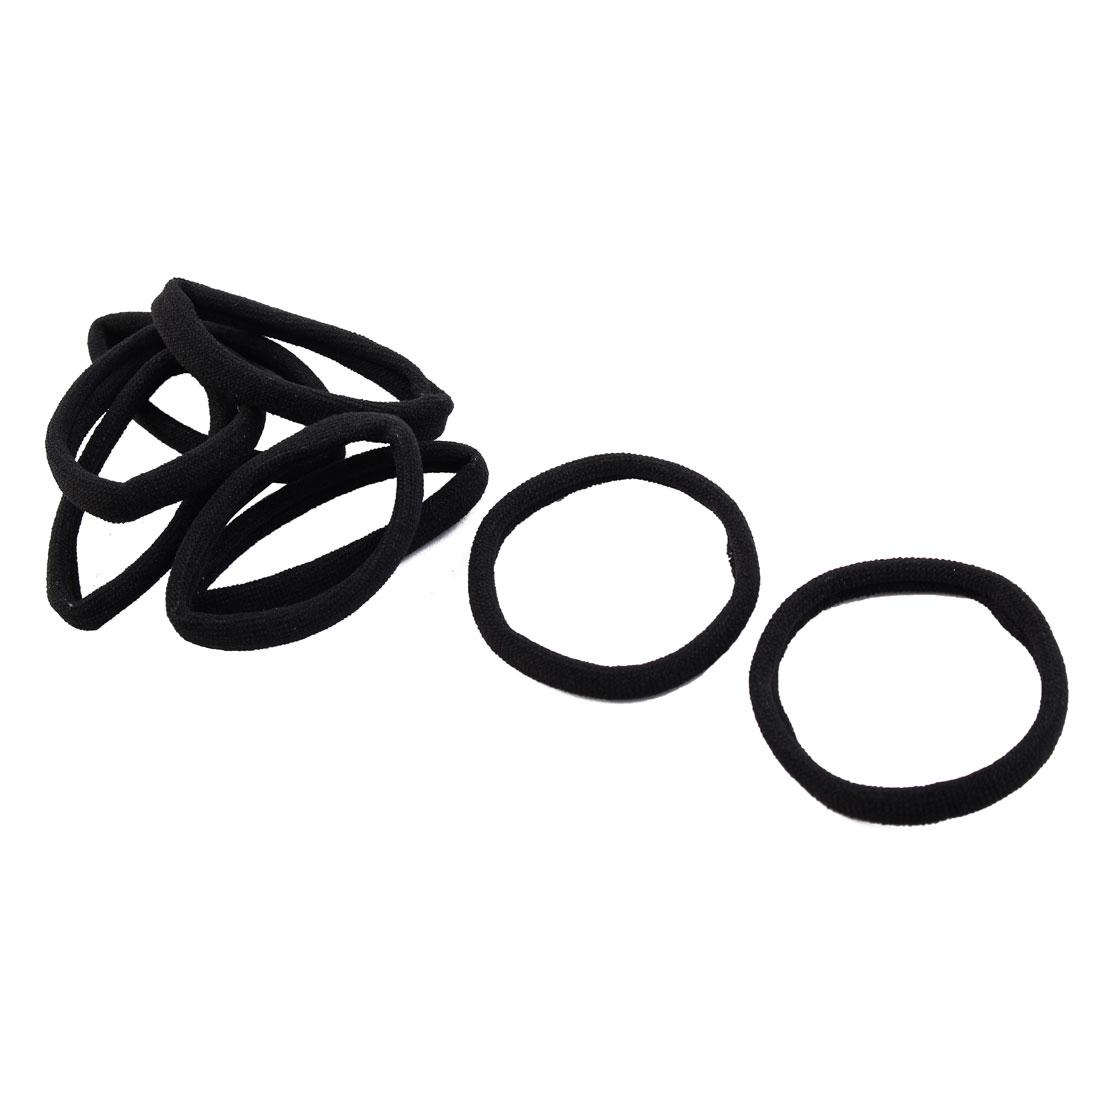 Women Elastic Fabric Stretchy Band Hair Tie Ponytail Holder Black 8pcs